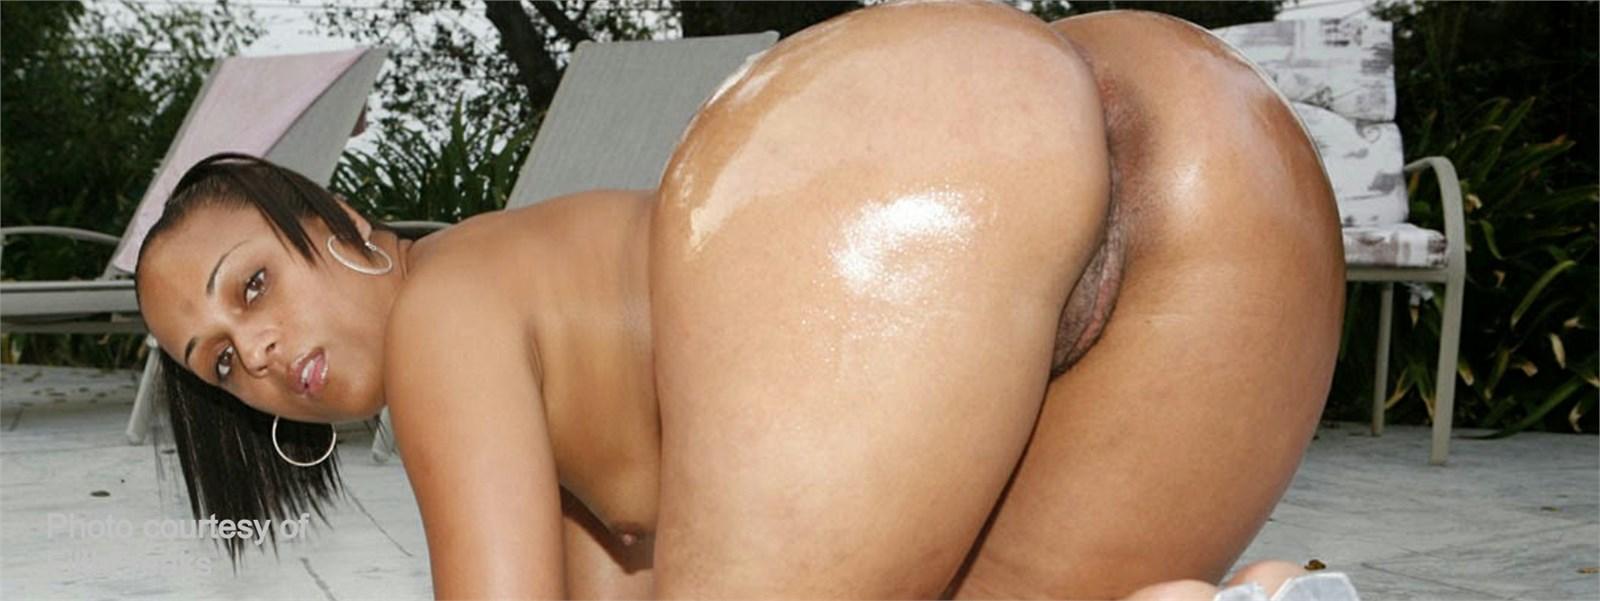 Big magazine lauren hutton nude pics